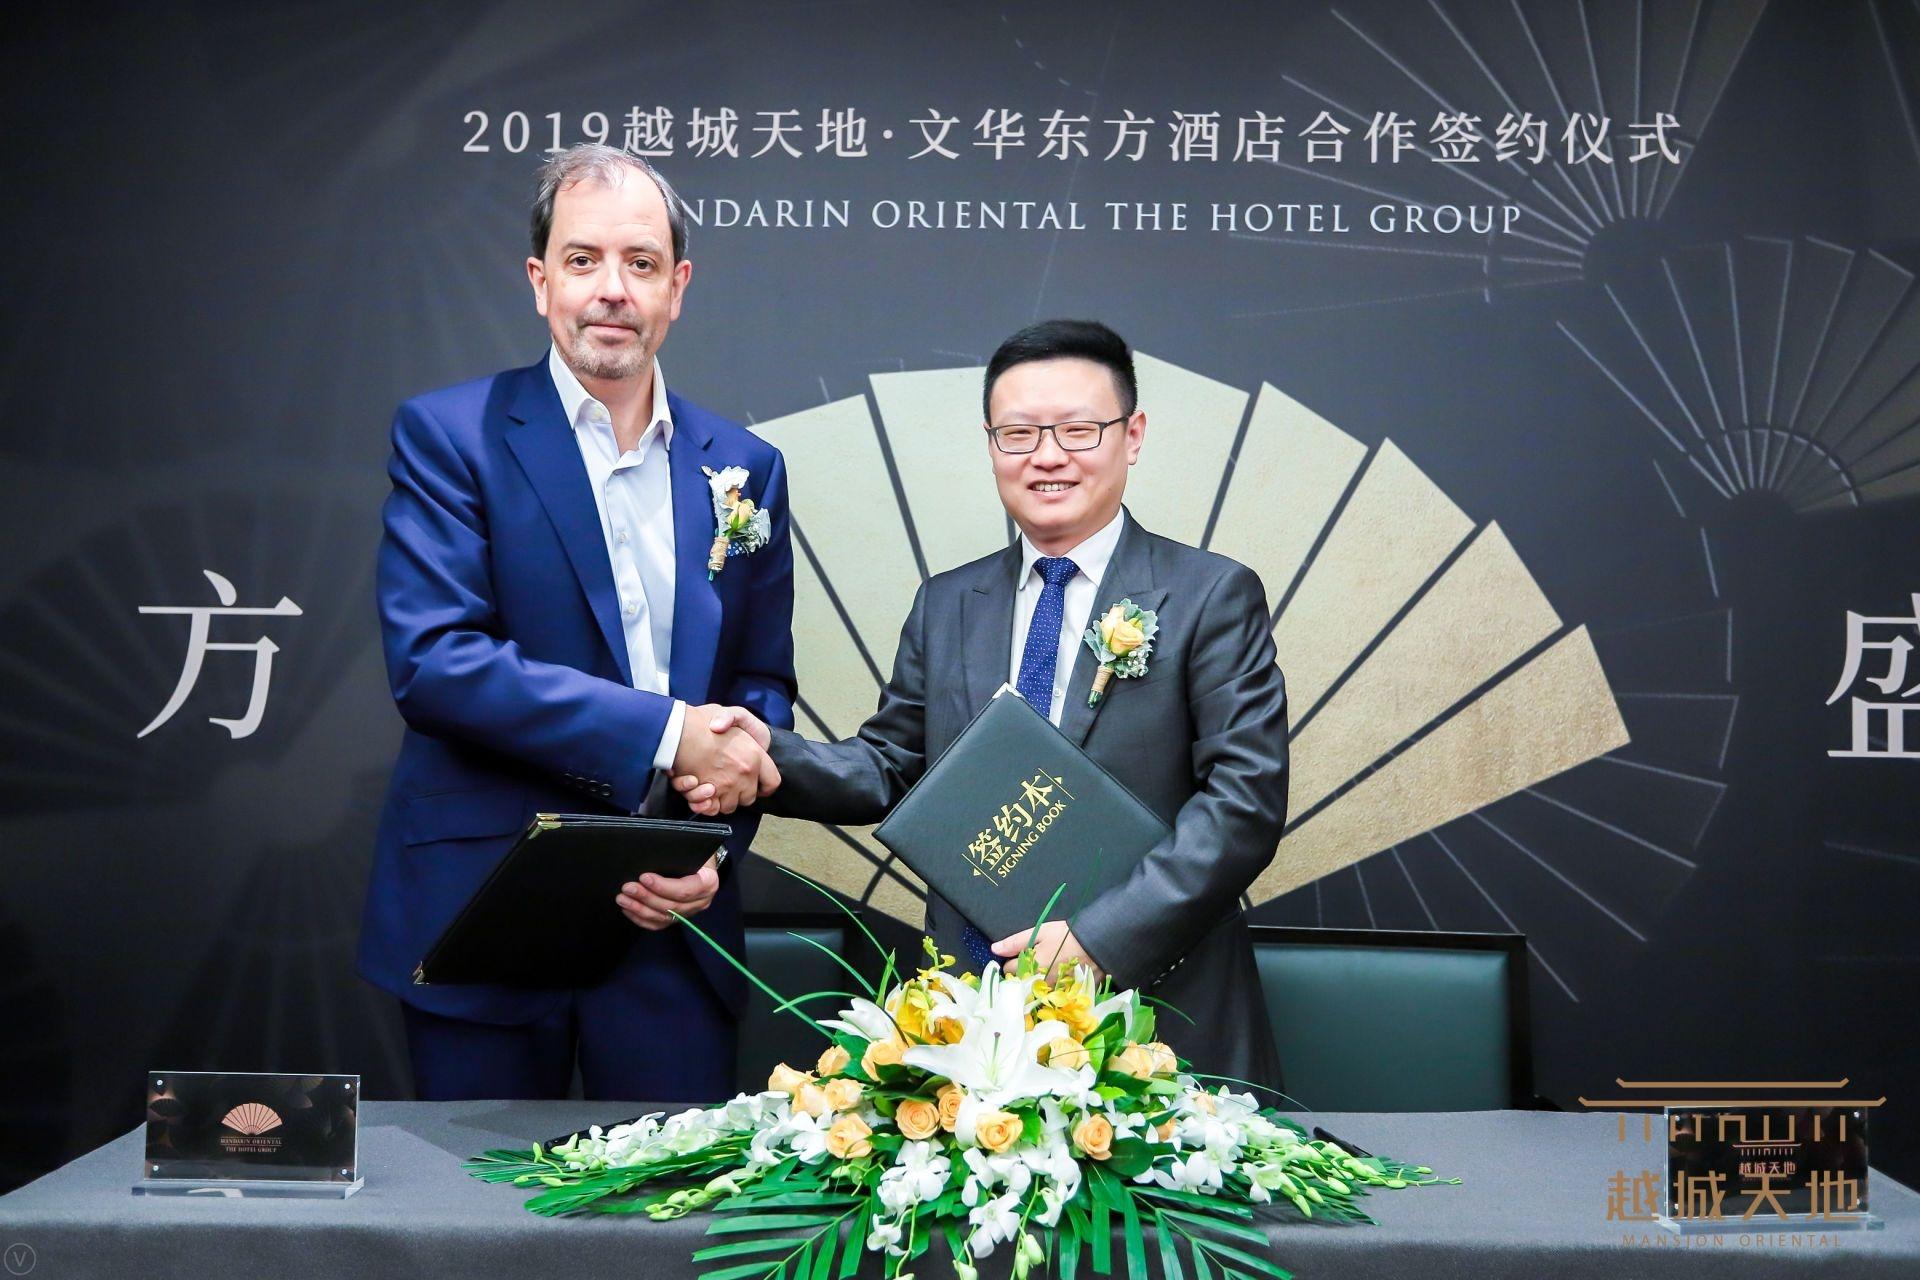 Mandarin Oriental Nanjing Signing Ceremony